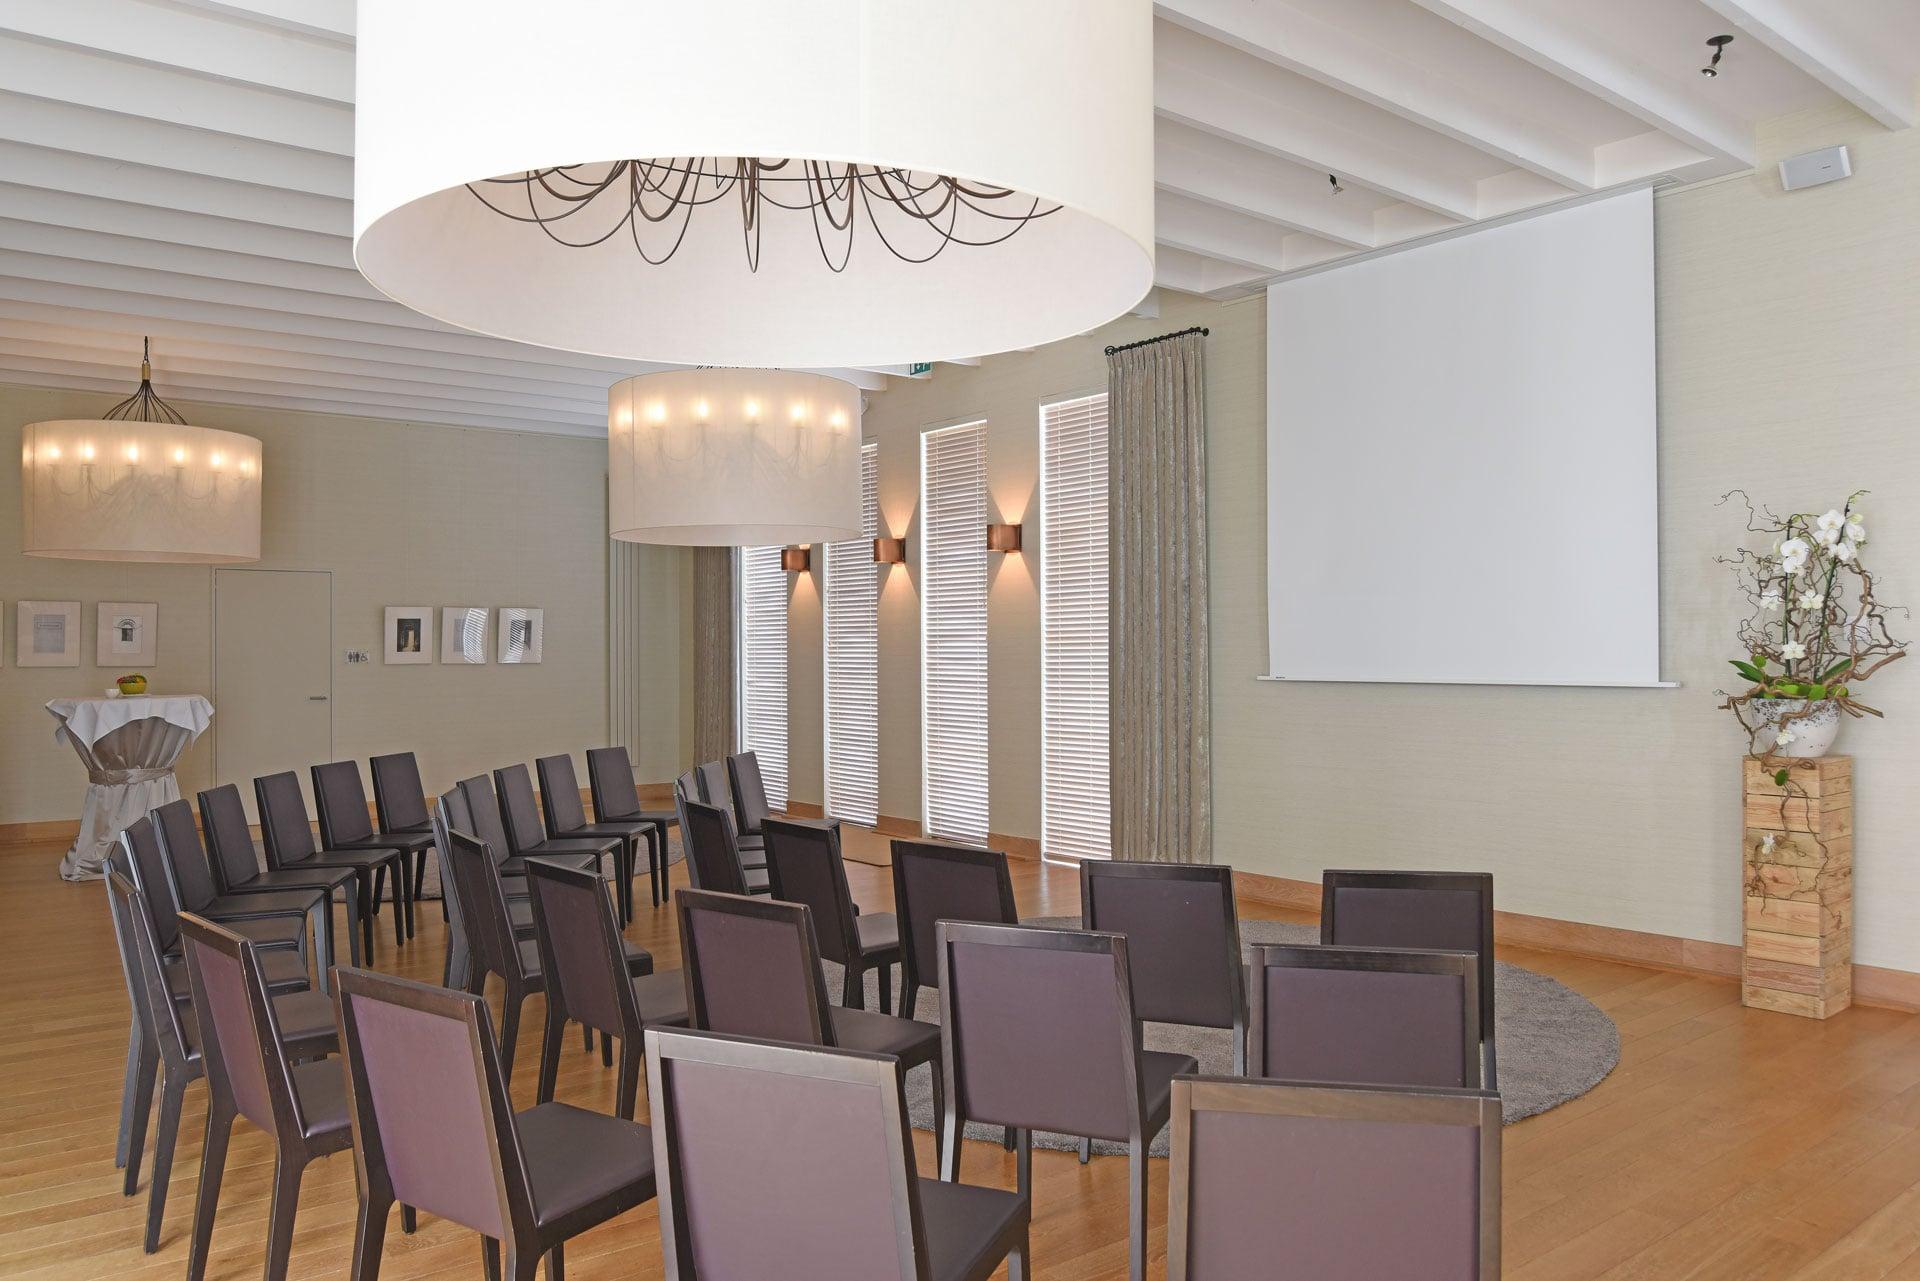 Salons 't Groenhof - Salons 't Groenhof